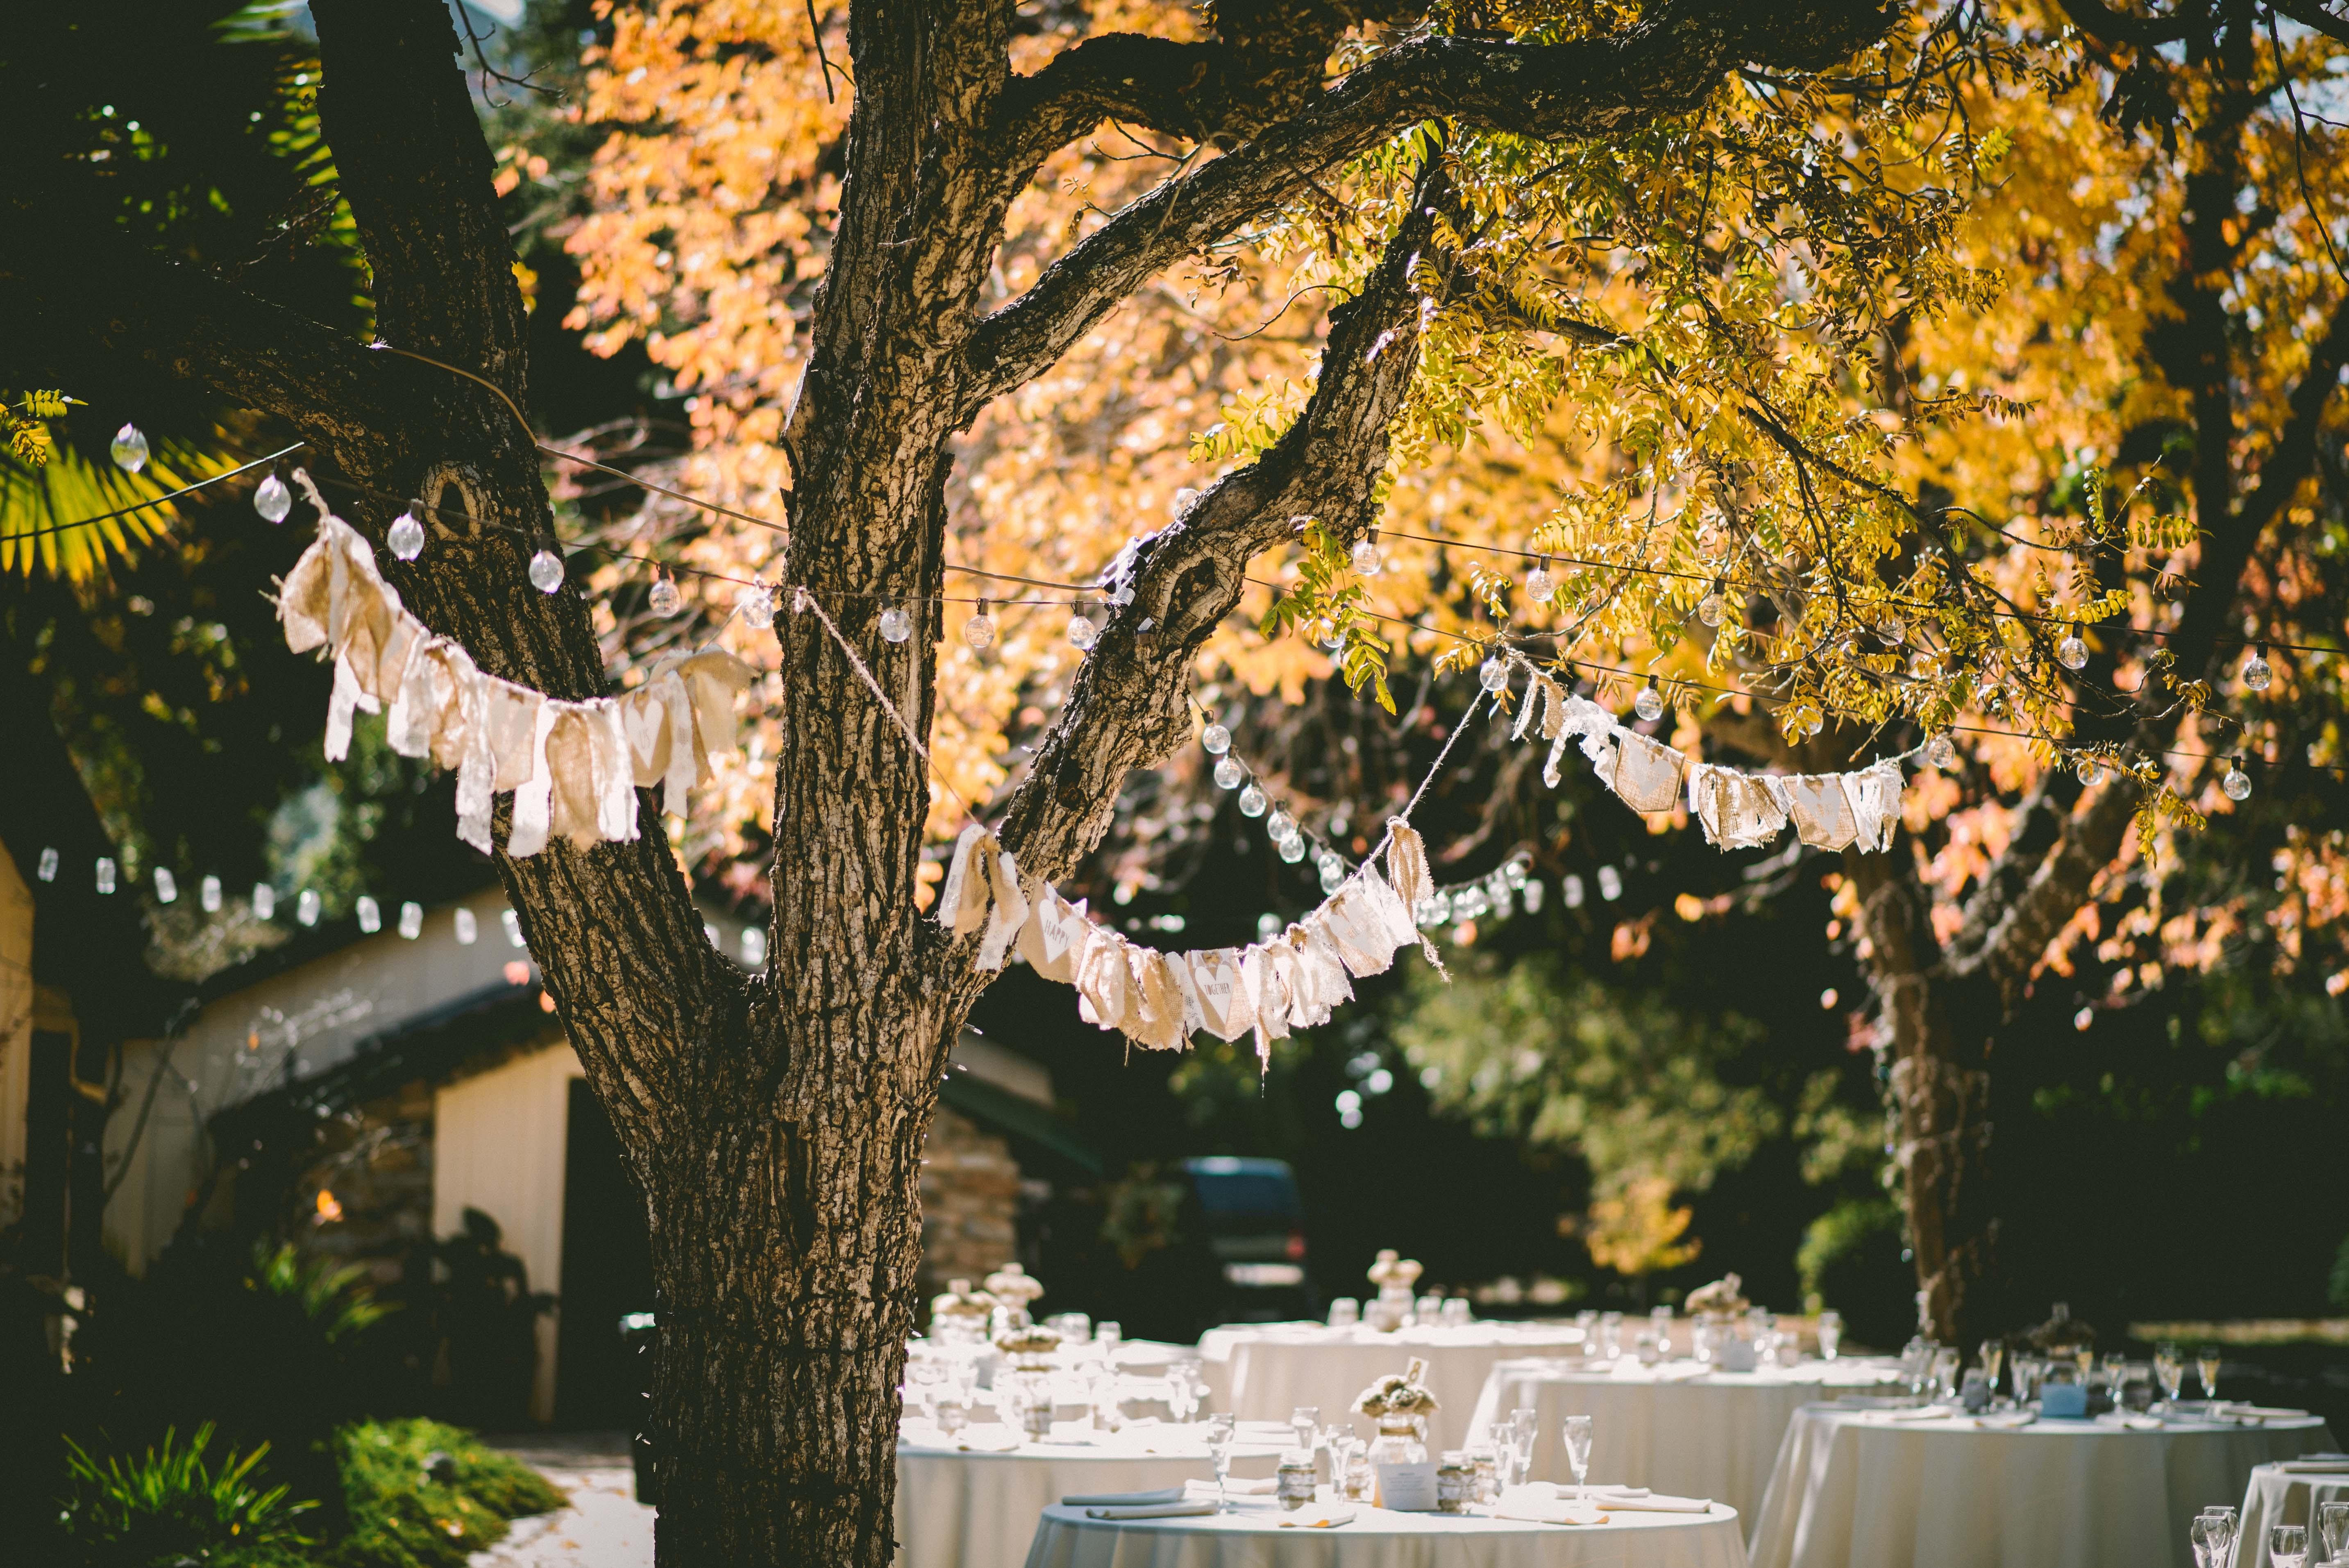 décorations mariage